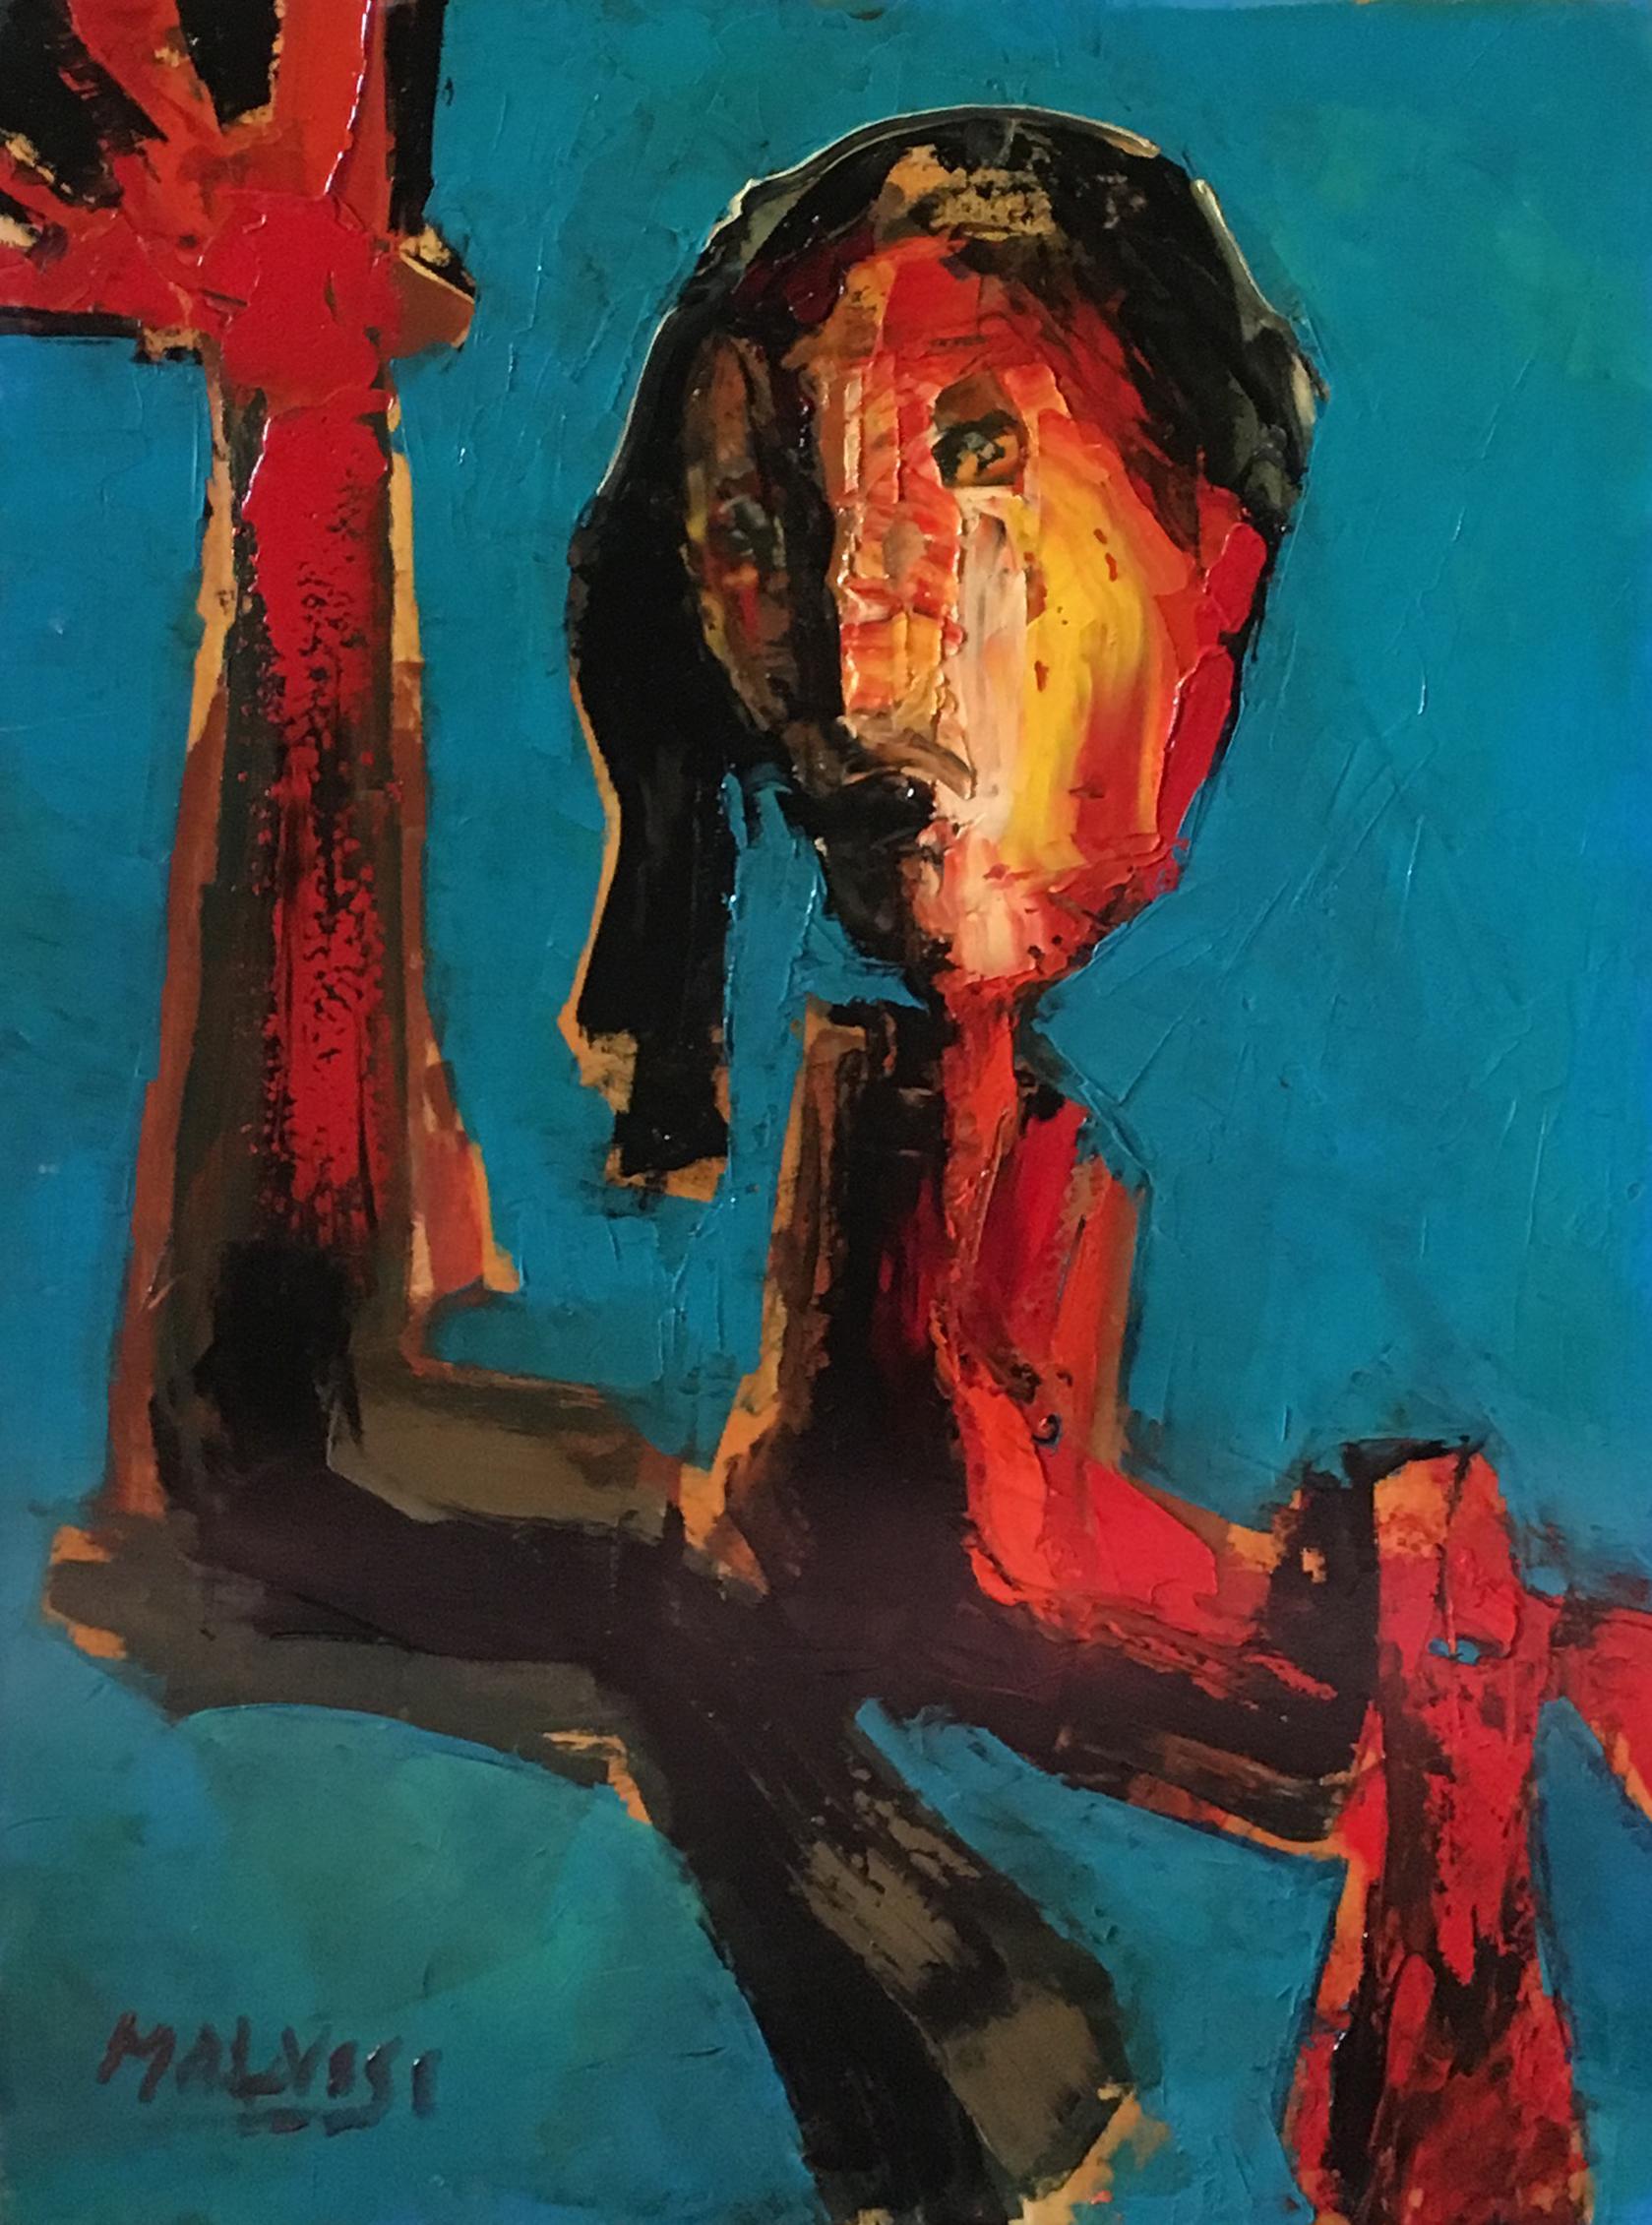 <b>The bosnian woman</b><br> (Orig. La signora bosniaca) <br> 1991 Oil on wood <br> cm 50 x 70